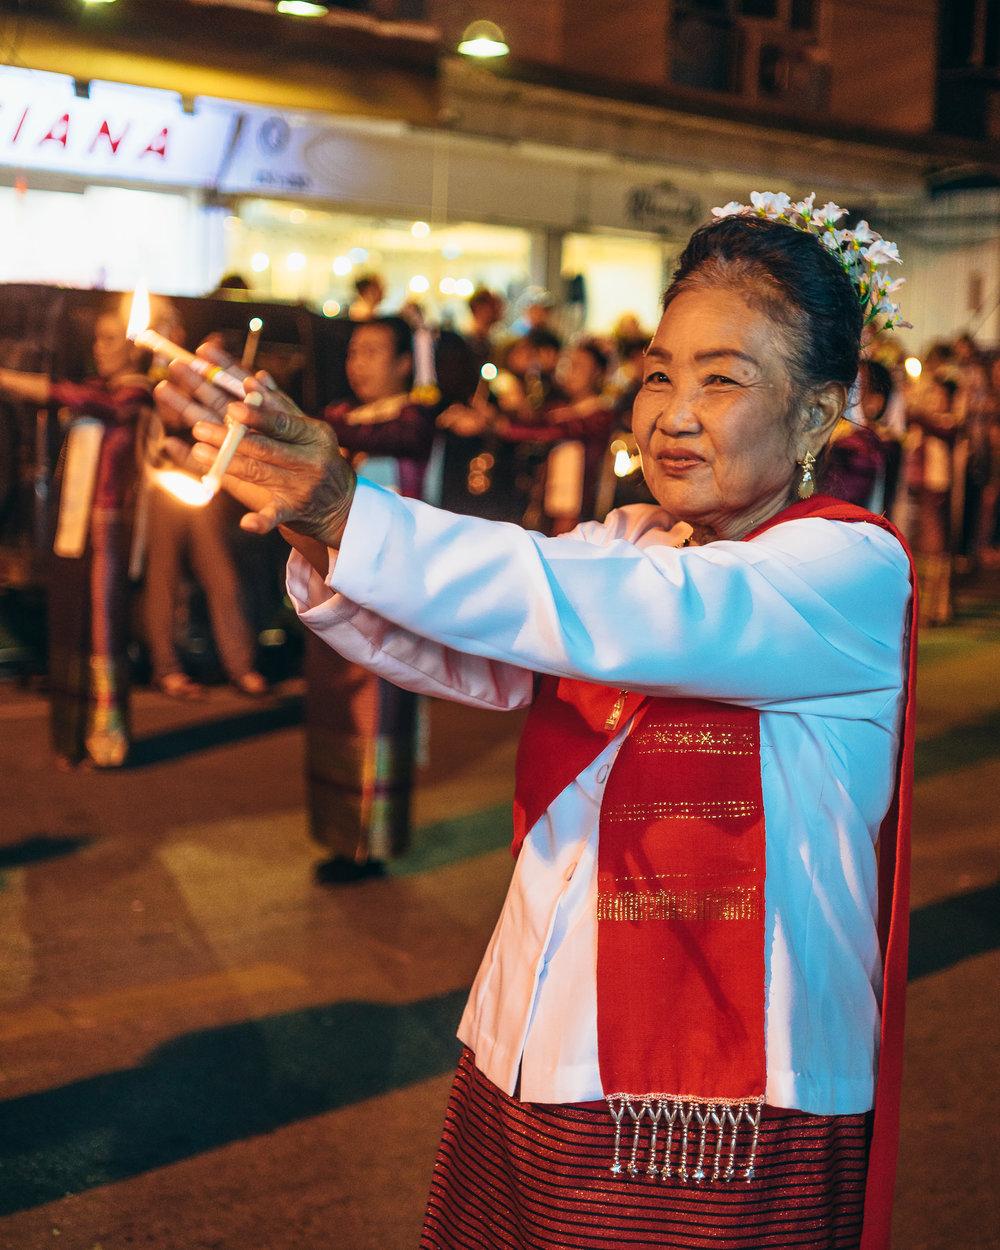 Chiang Mai Loi Krathong Yee Peng-6.jpg